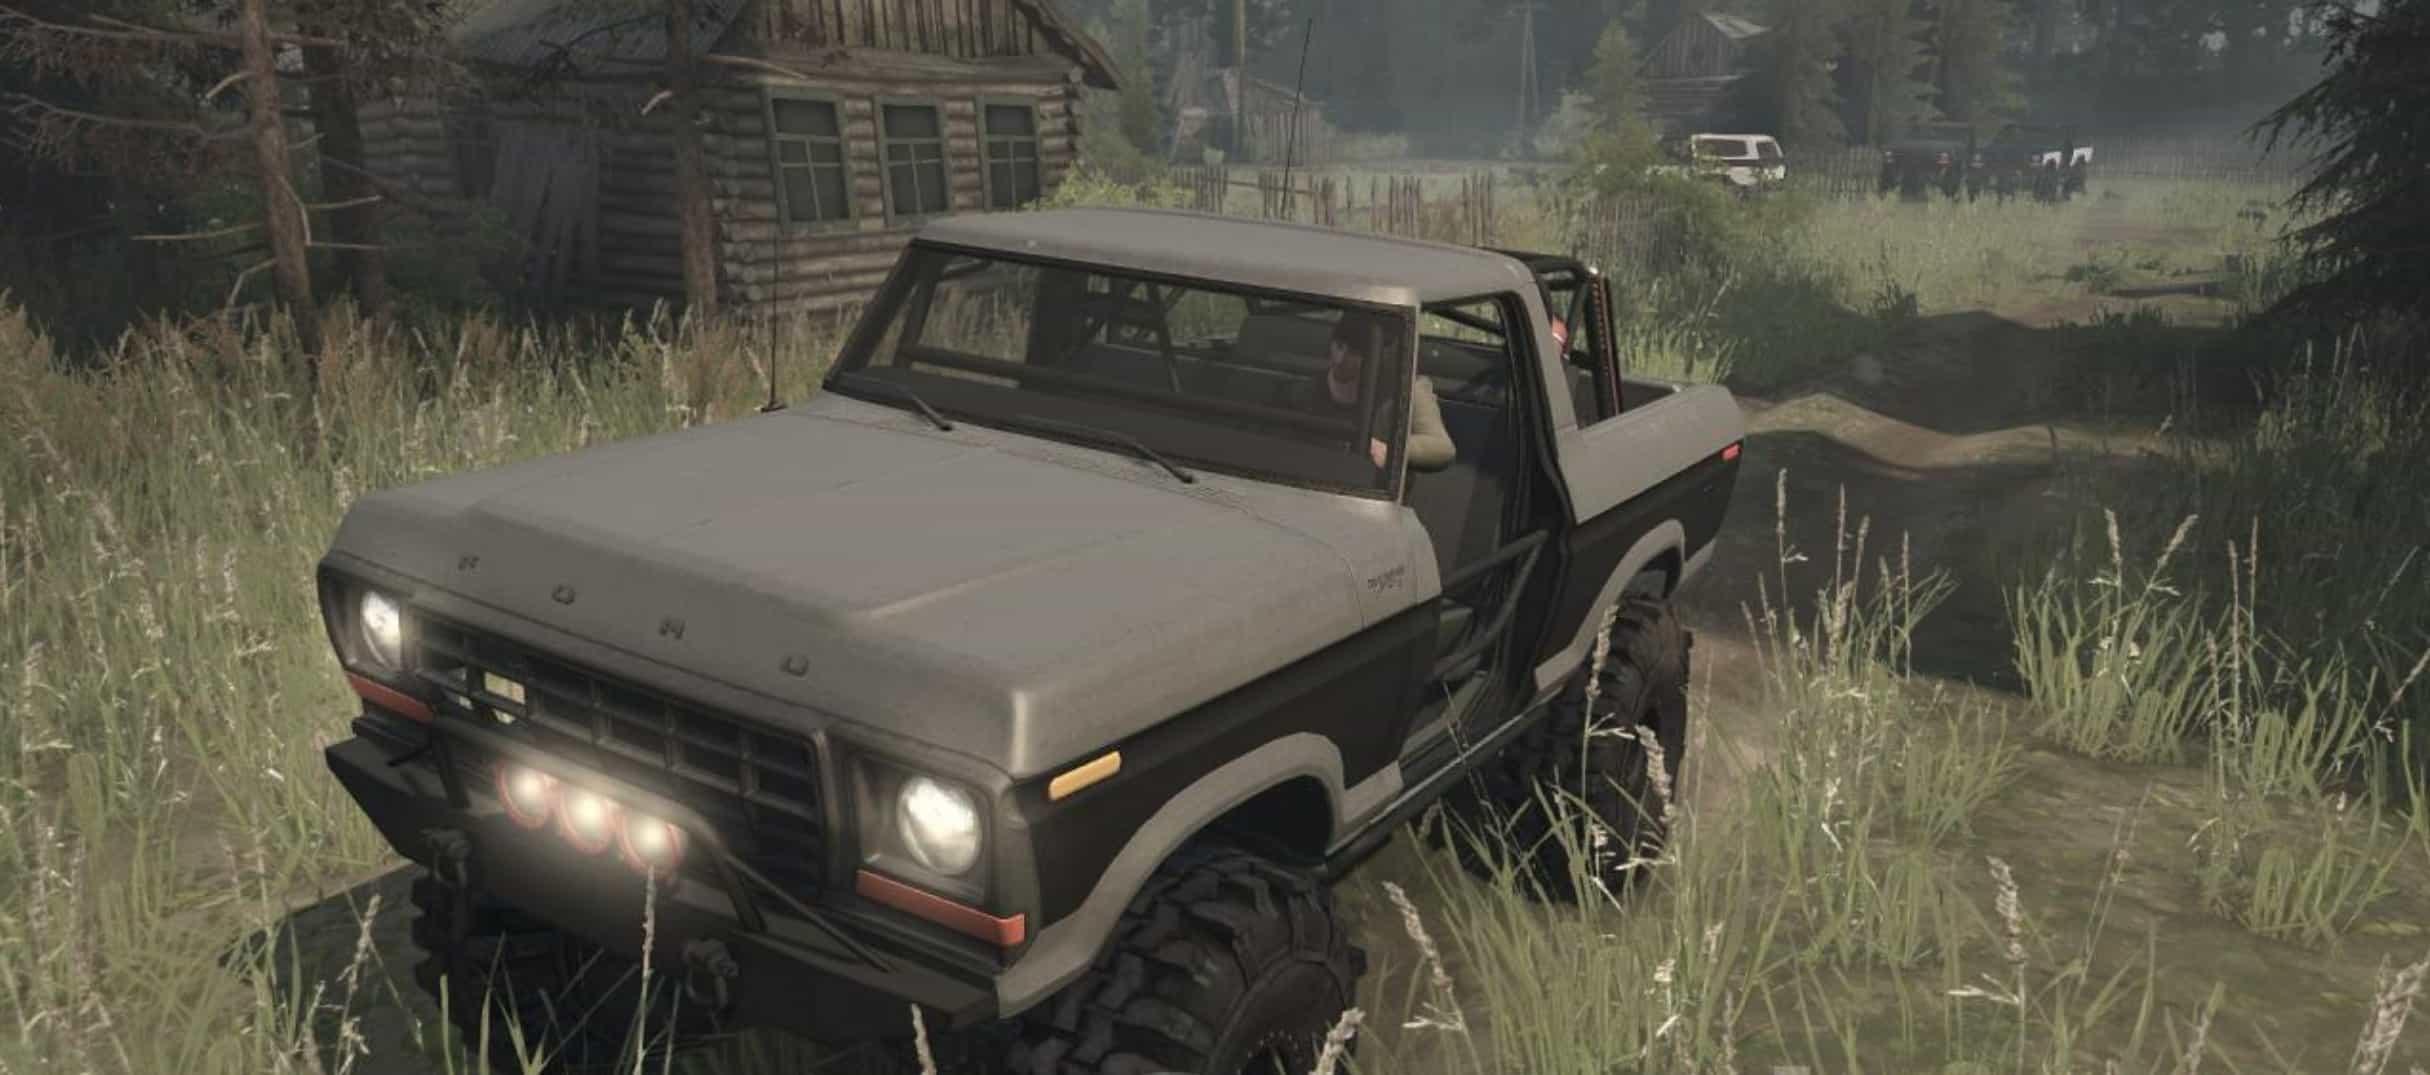 Ford Bronco Custom 1978 v09.12.17 - Spintires: MudRunner Mod